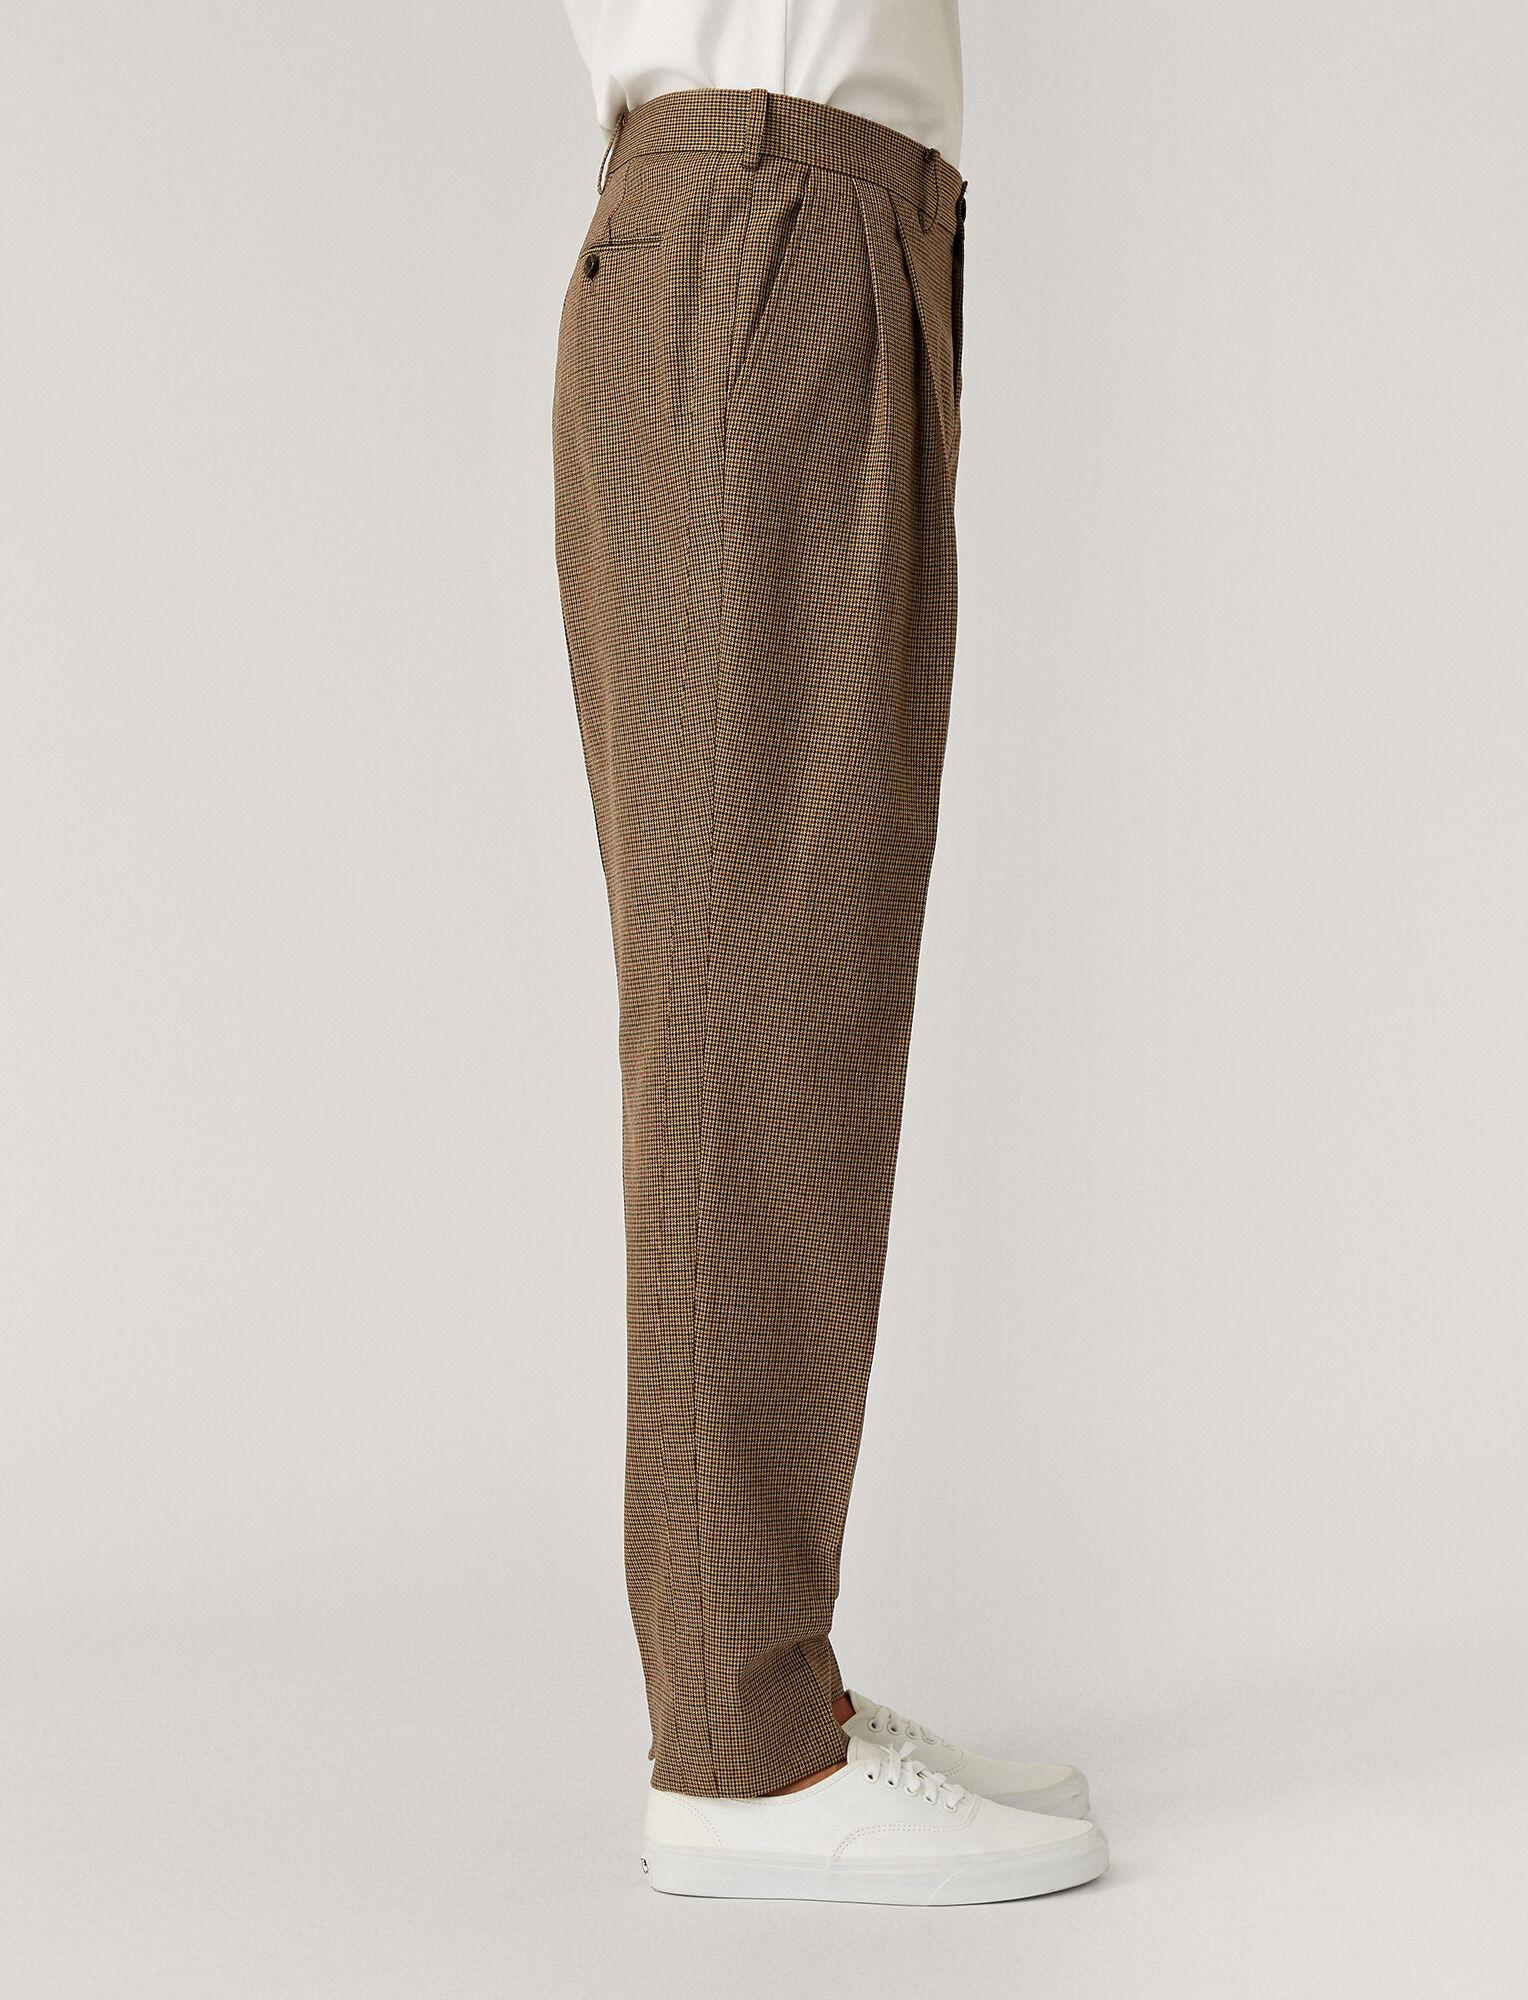 Joseph, Pantalon Covert Gun Club, in Beige